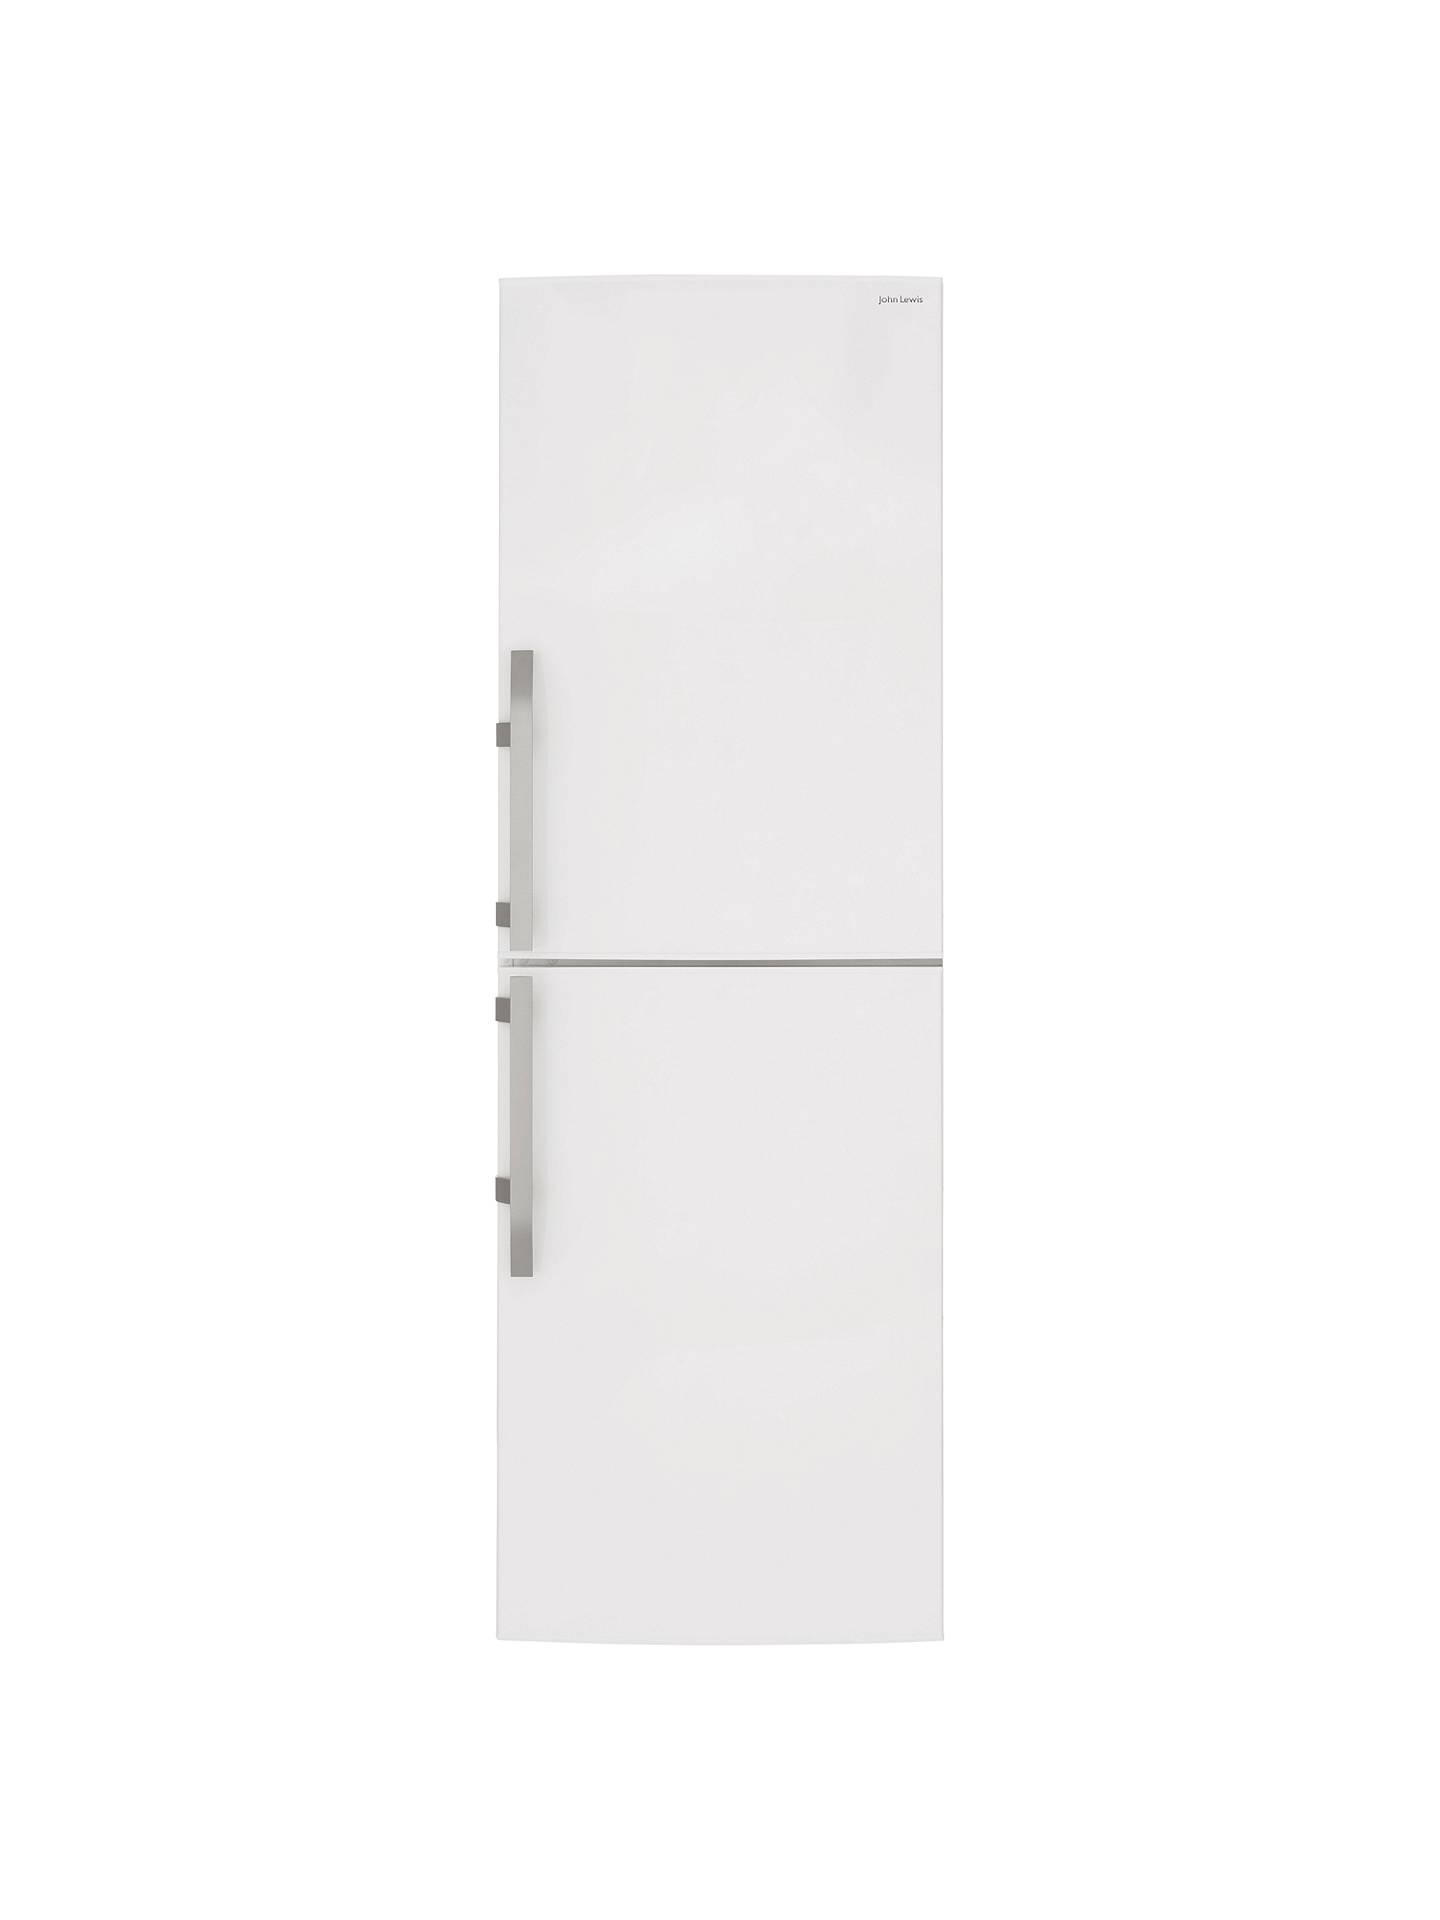 john lewis jlffw1818 fridge freezer a energy rating. Black Bedroom Furniture Sets. Home Design Ideas